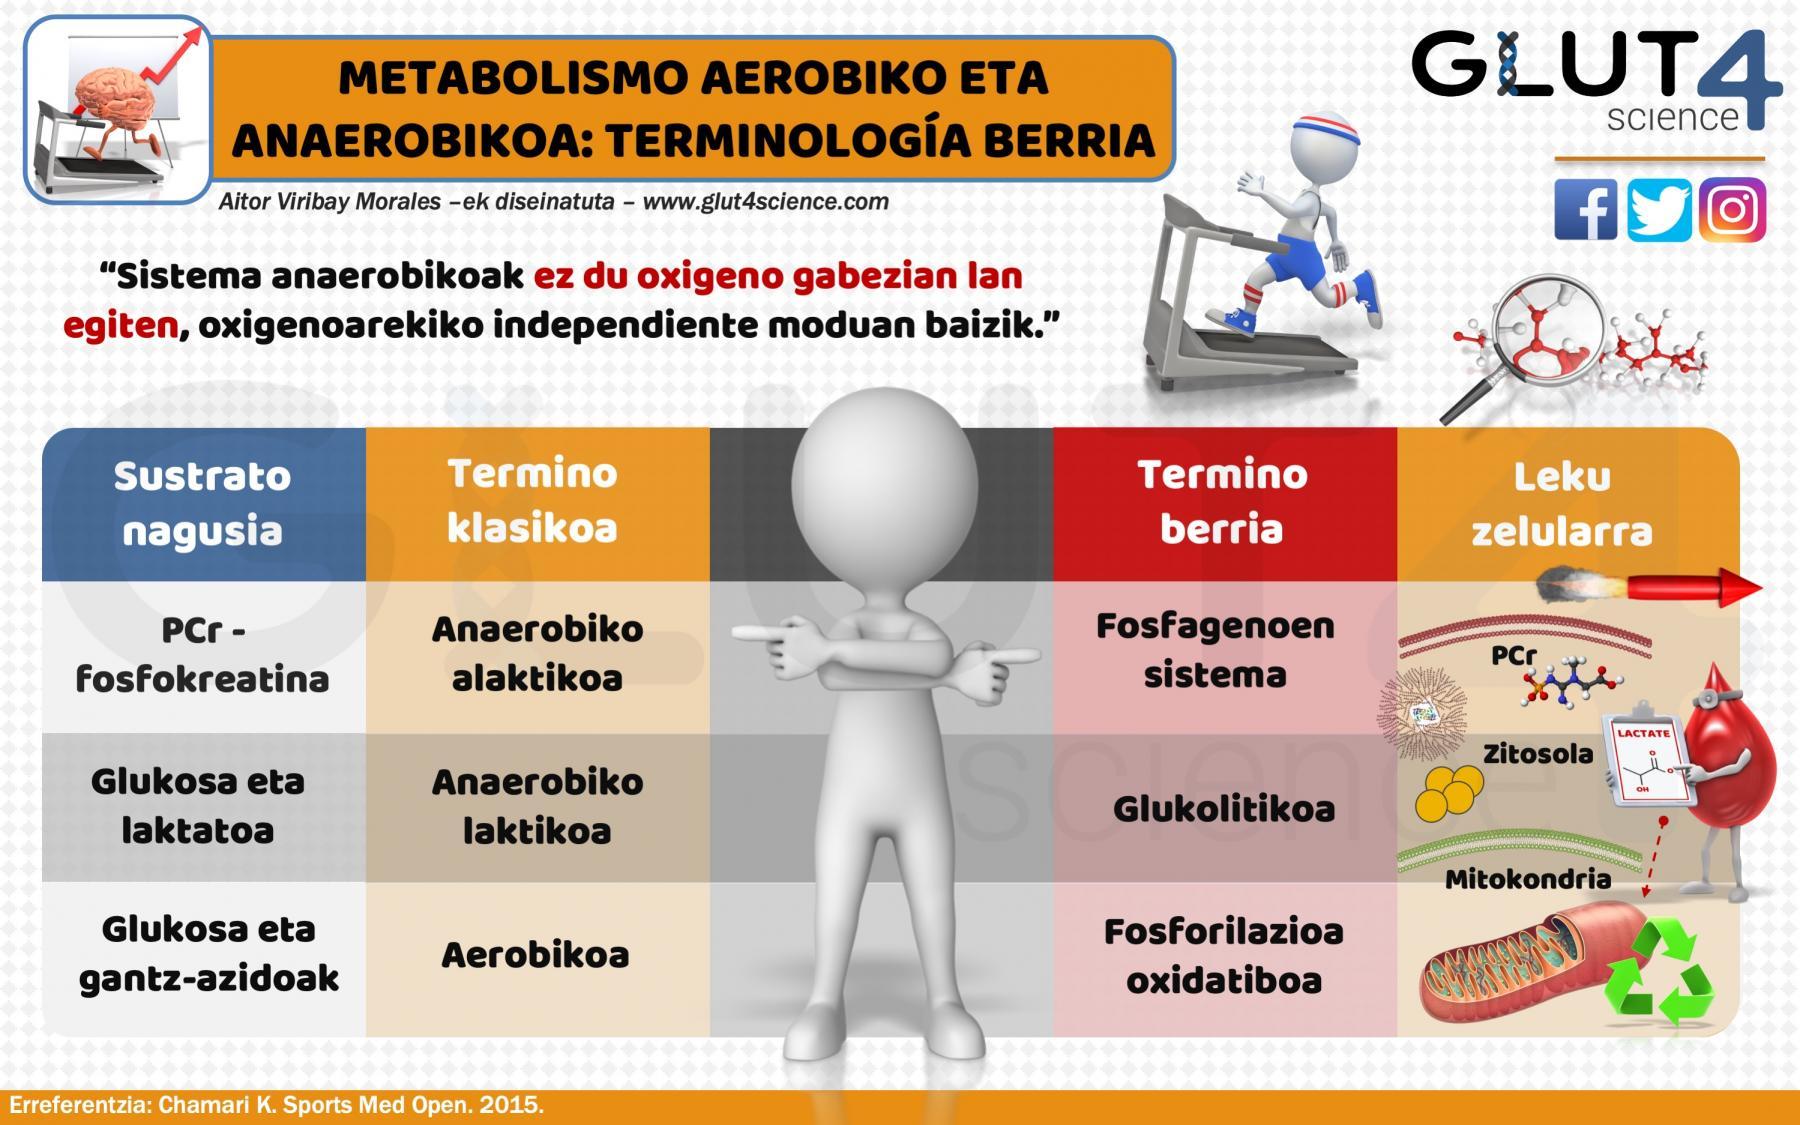 Aerobiko eta anaerobiko: Terminologia berria